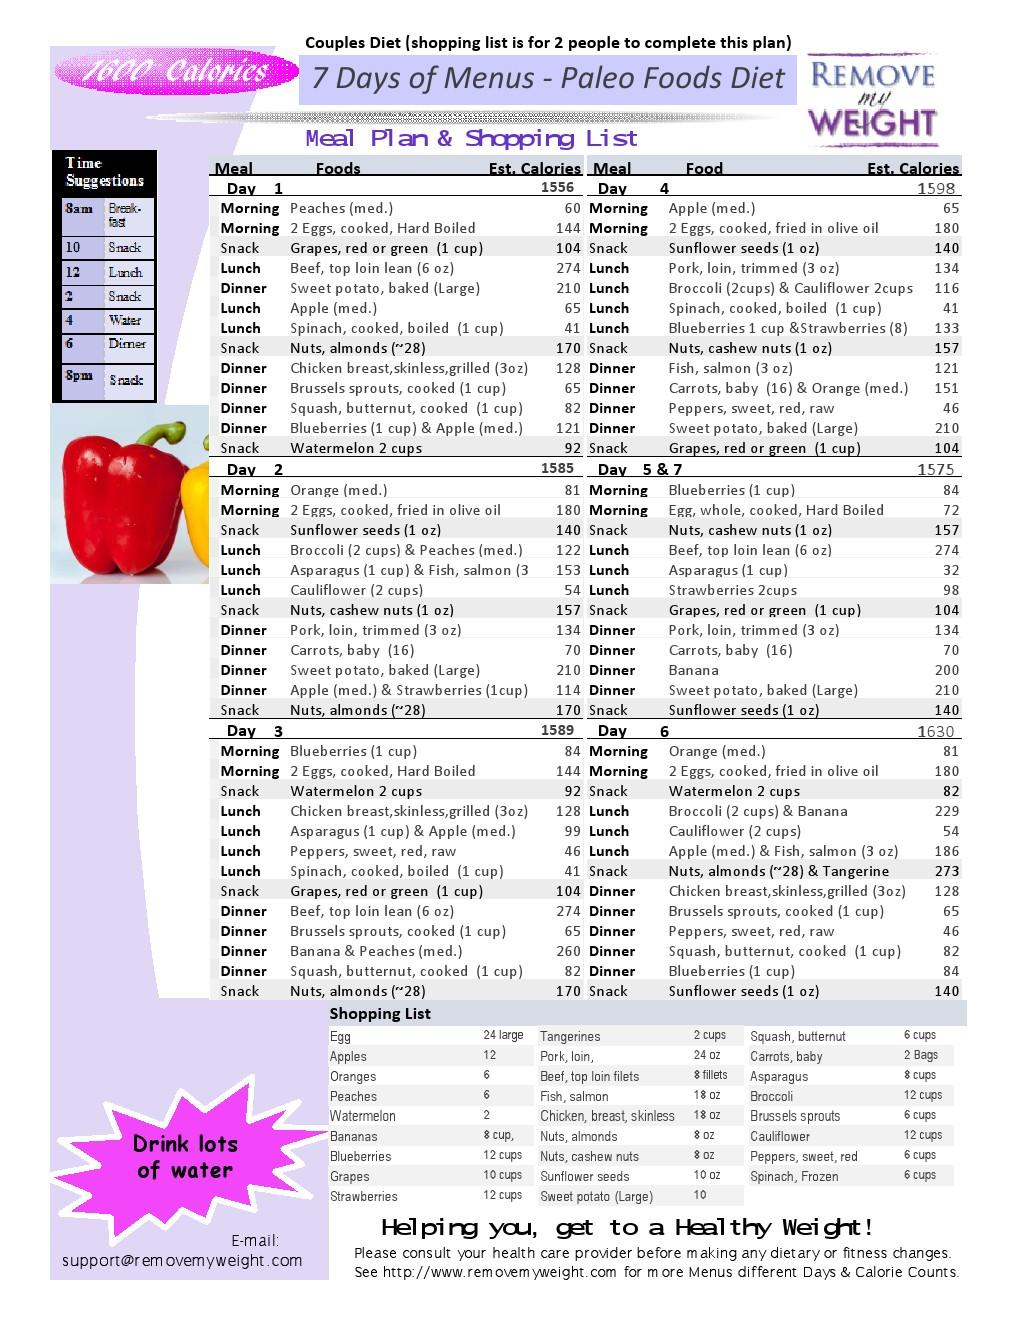 1600 Calorie Paleo Diet 7 Day Menu Plan for Couples ...